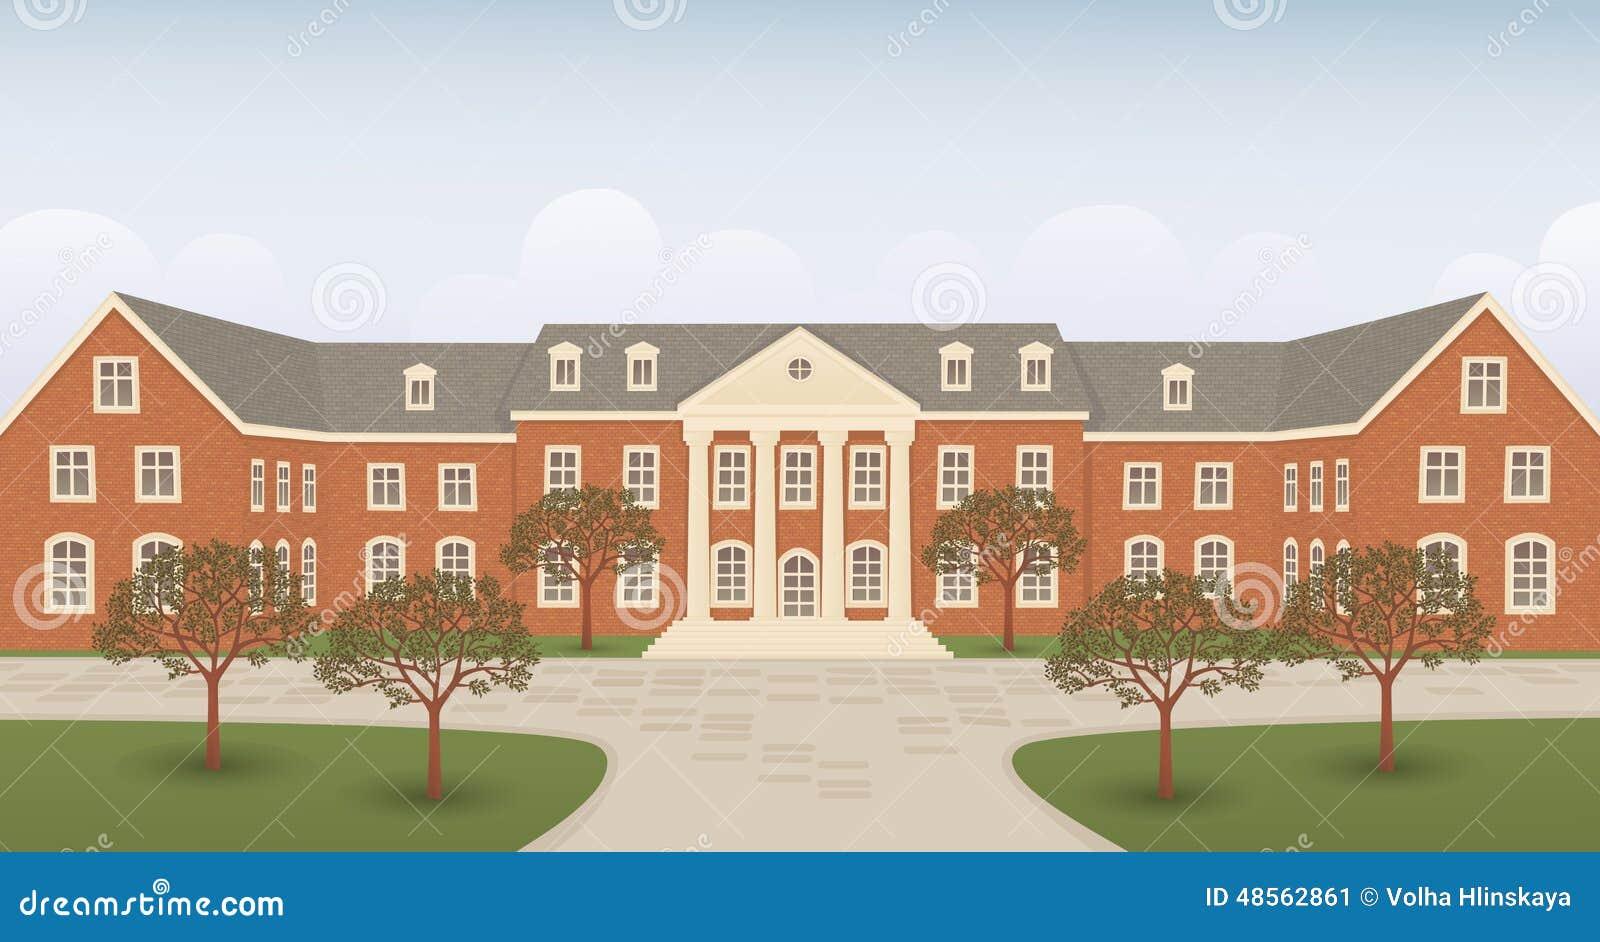 college-building-green-campus-48562861.jpg